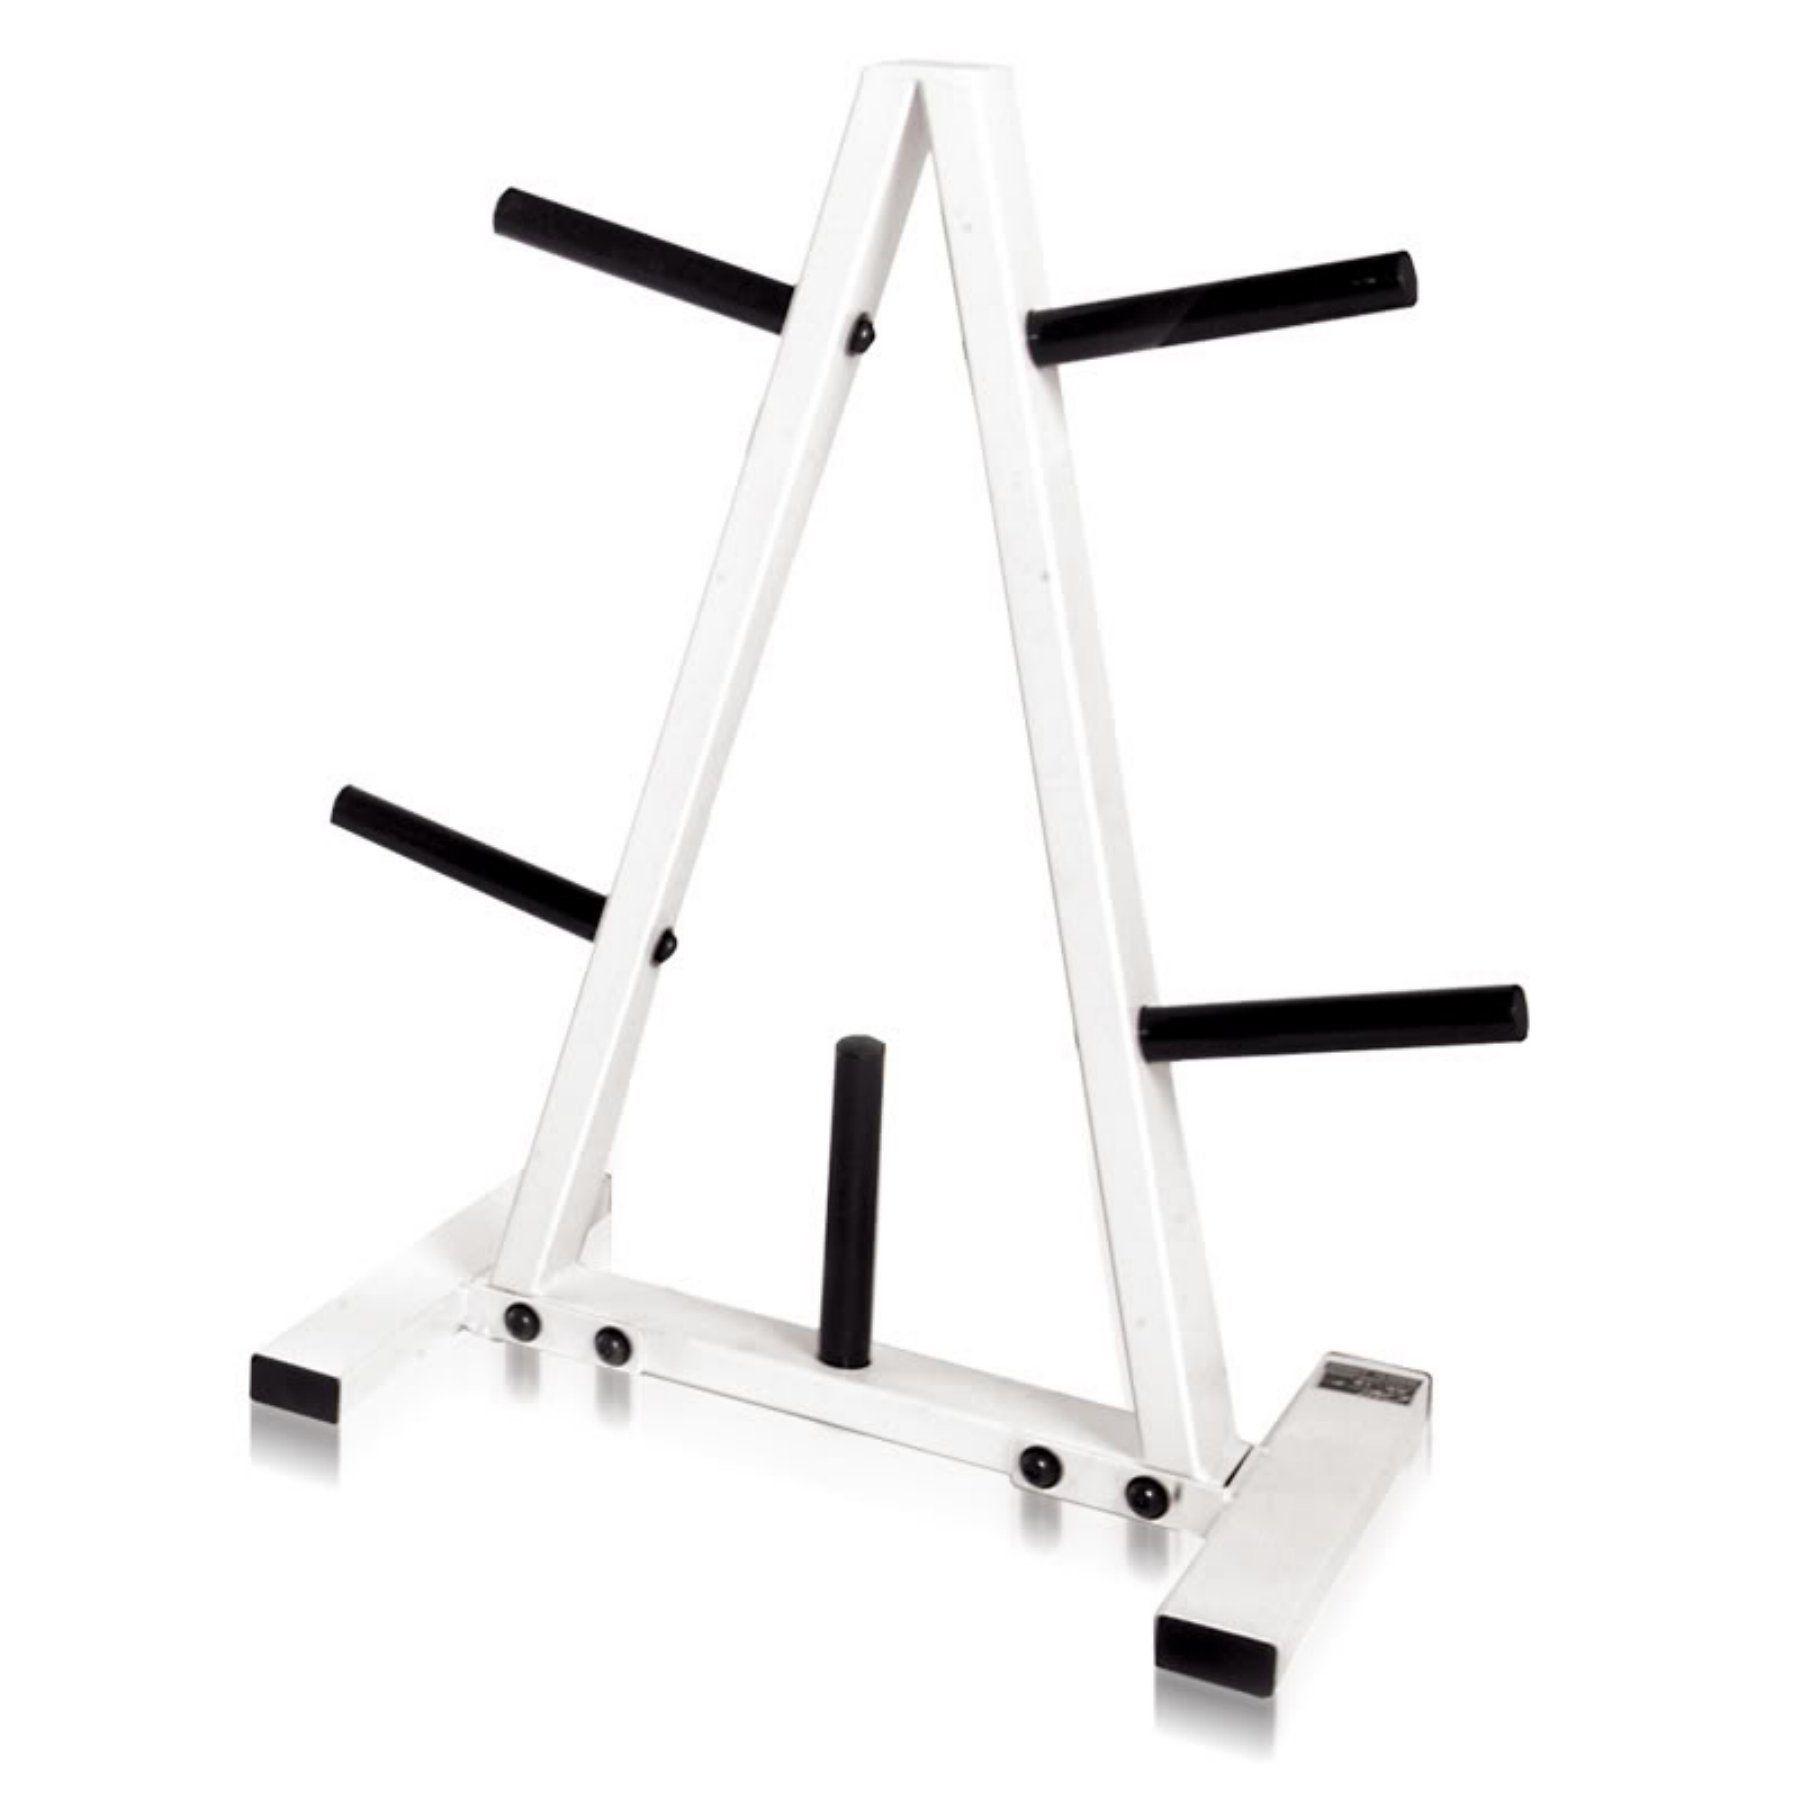 CAP Barbell Black/White 1 in. Plate Rack - RK-1B